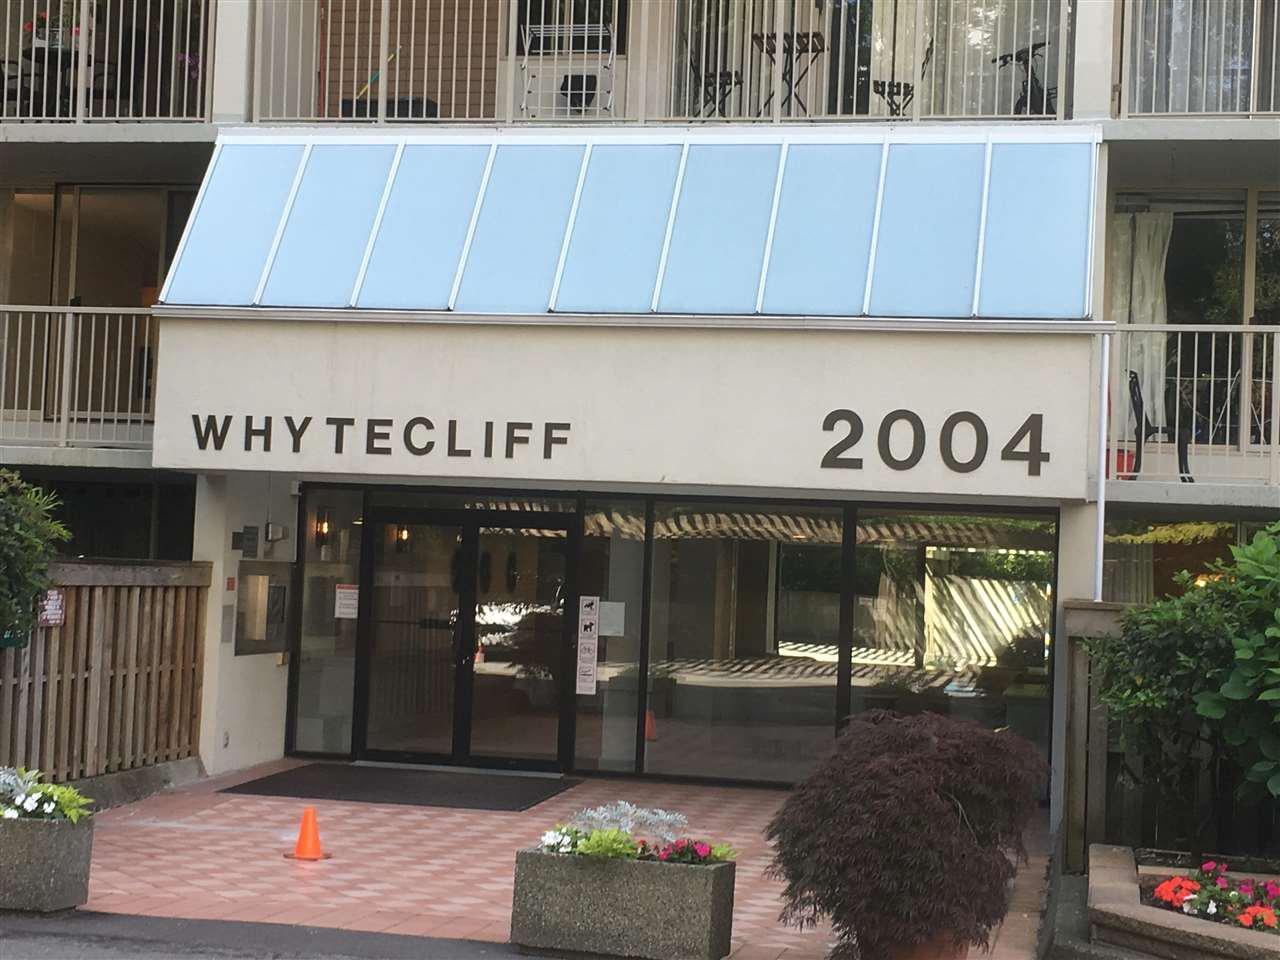 "Main Photo: 304 2004 FULLERTON Avenue in North Vancouver: Pemberton NV Condo for sale in ""WHYTCLIFF"" : MLS®# R2382568"